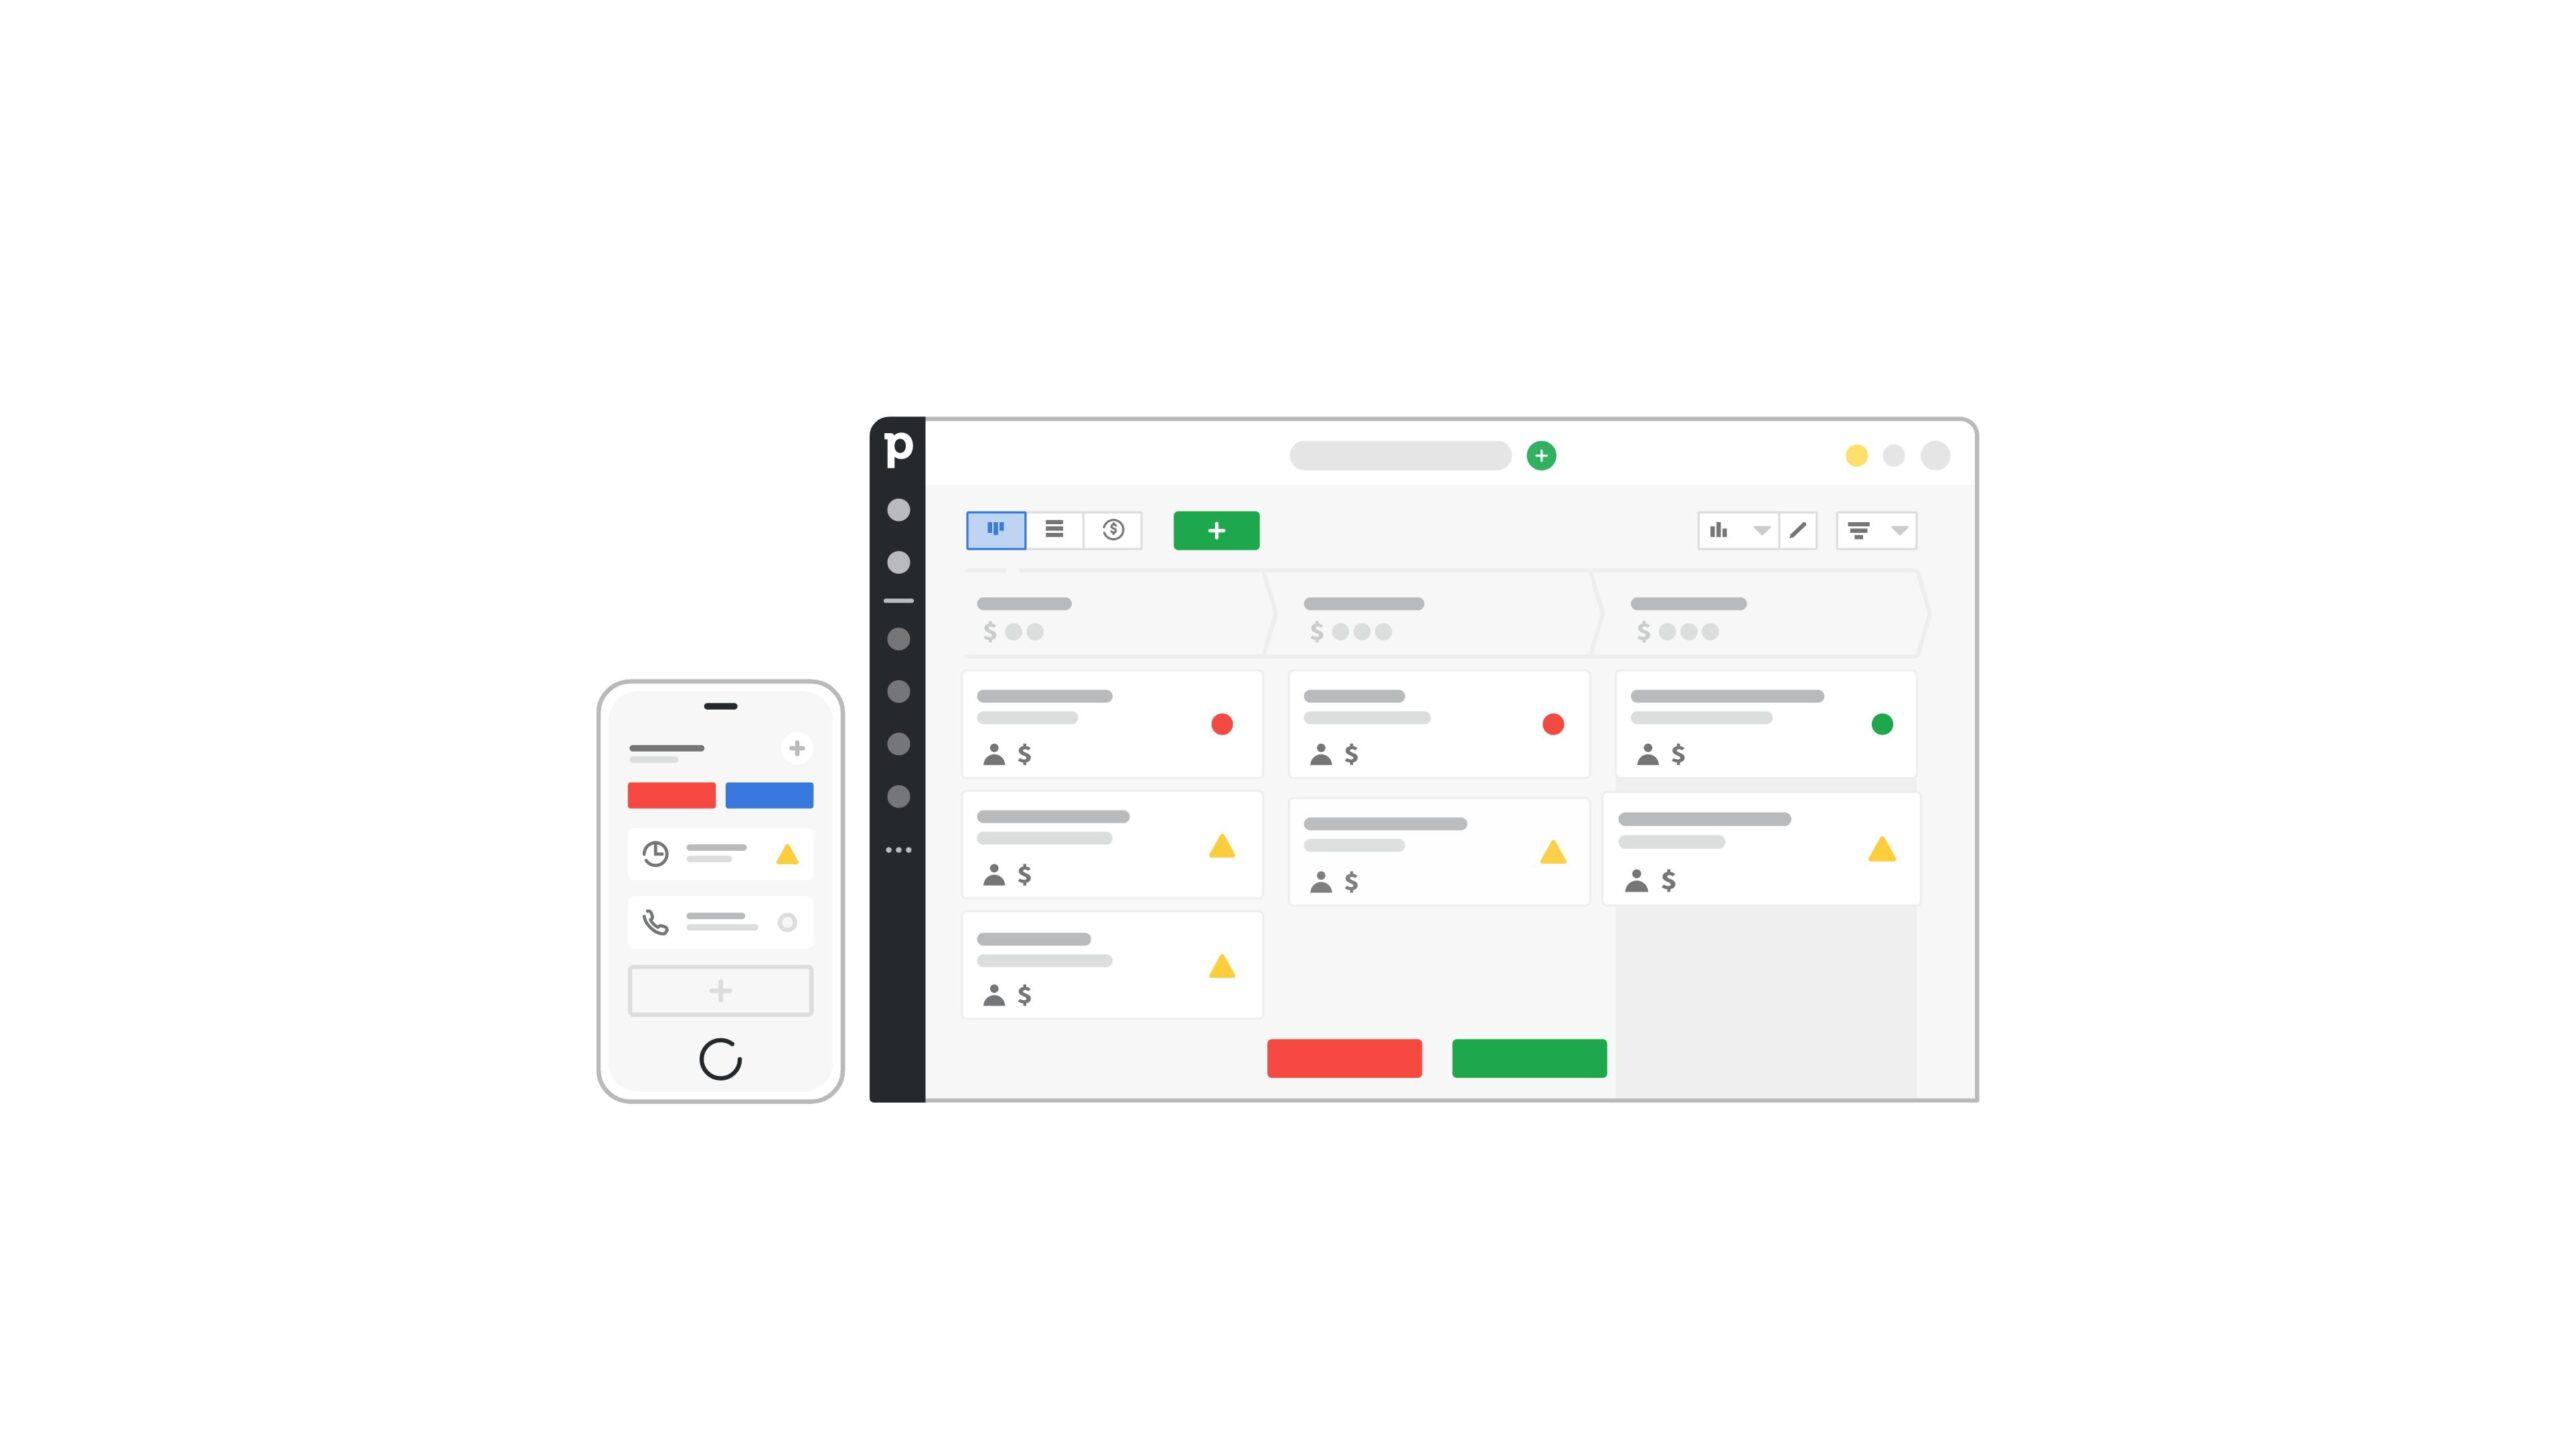 Orpetron Web Design Awards - Pipedrive - Web Design Awards Inspiration Trends UI UX